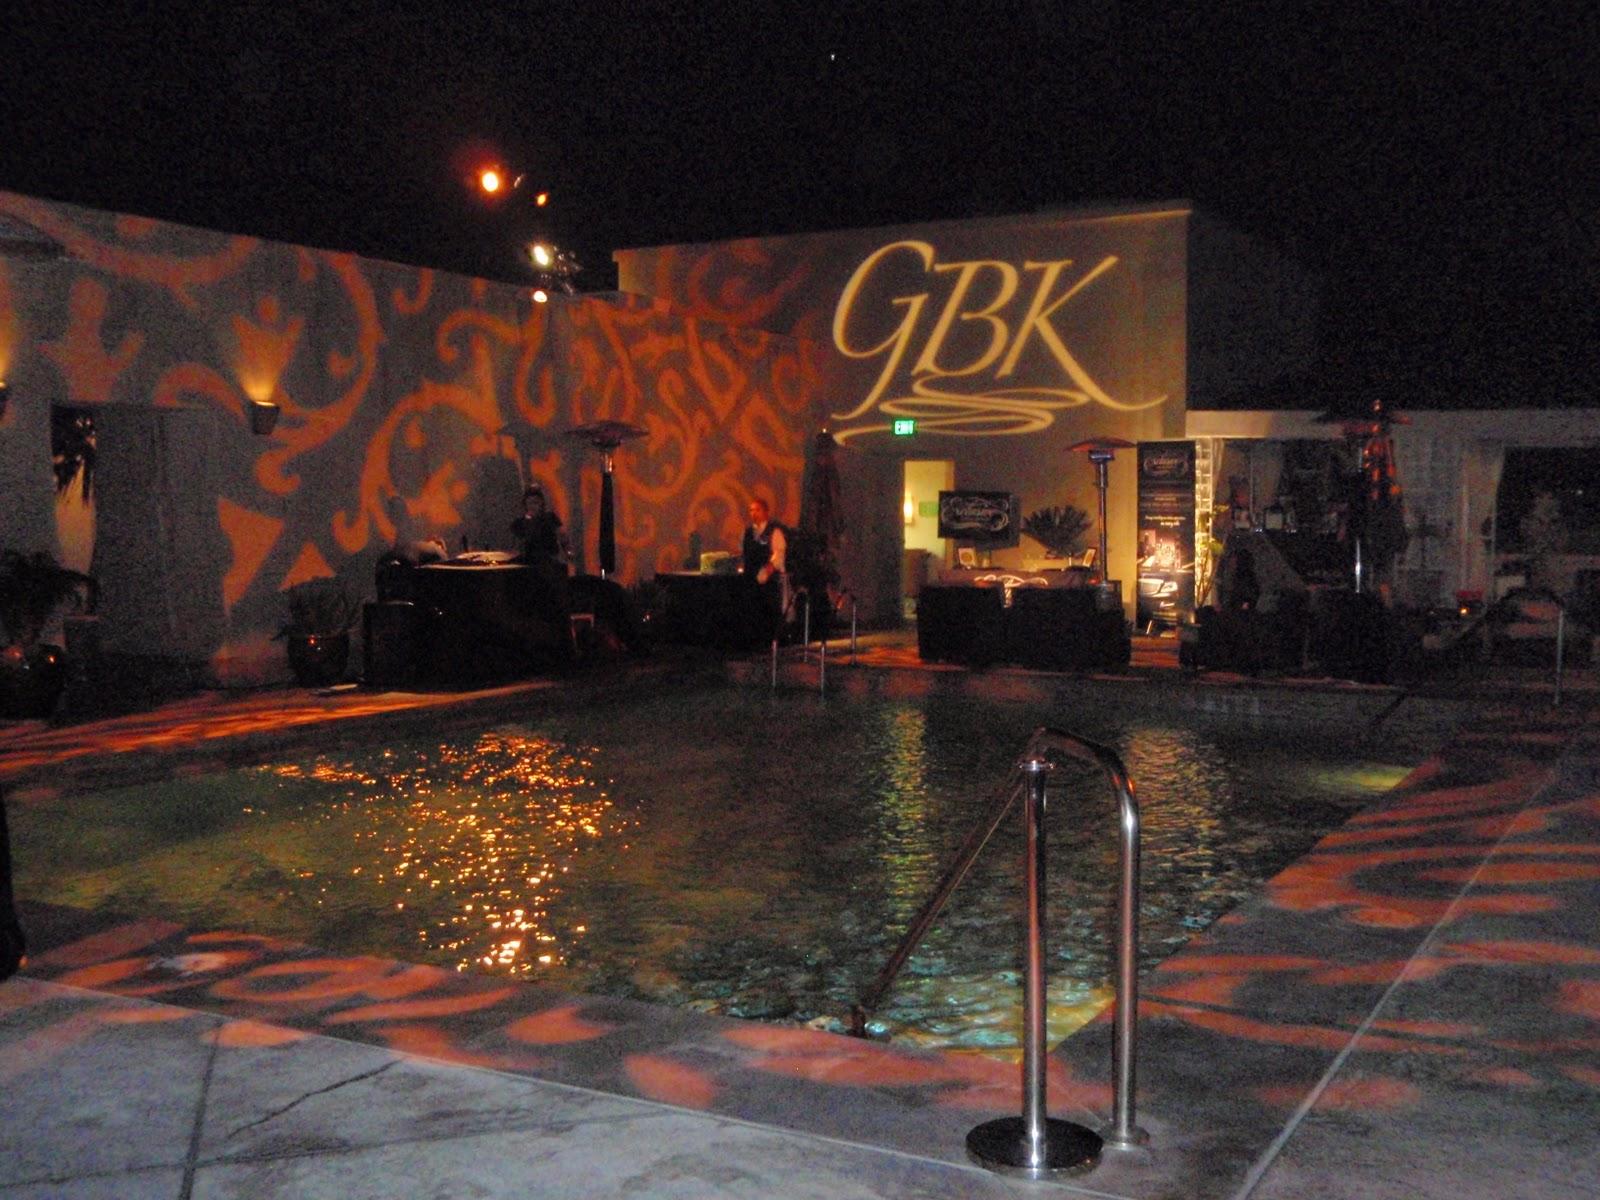 Gbk gifting suite